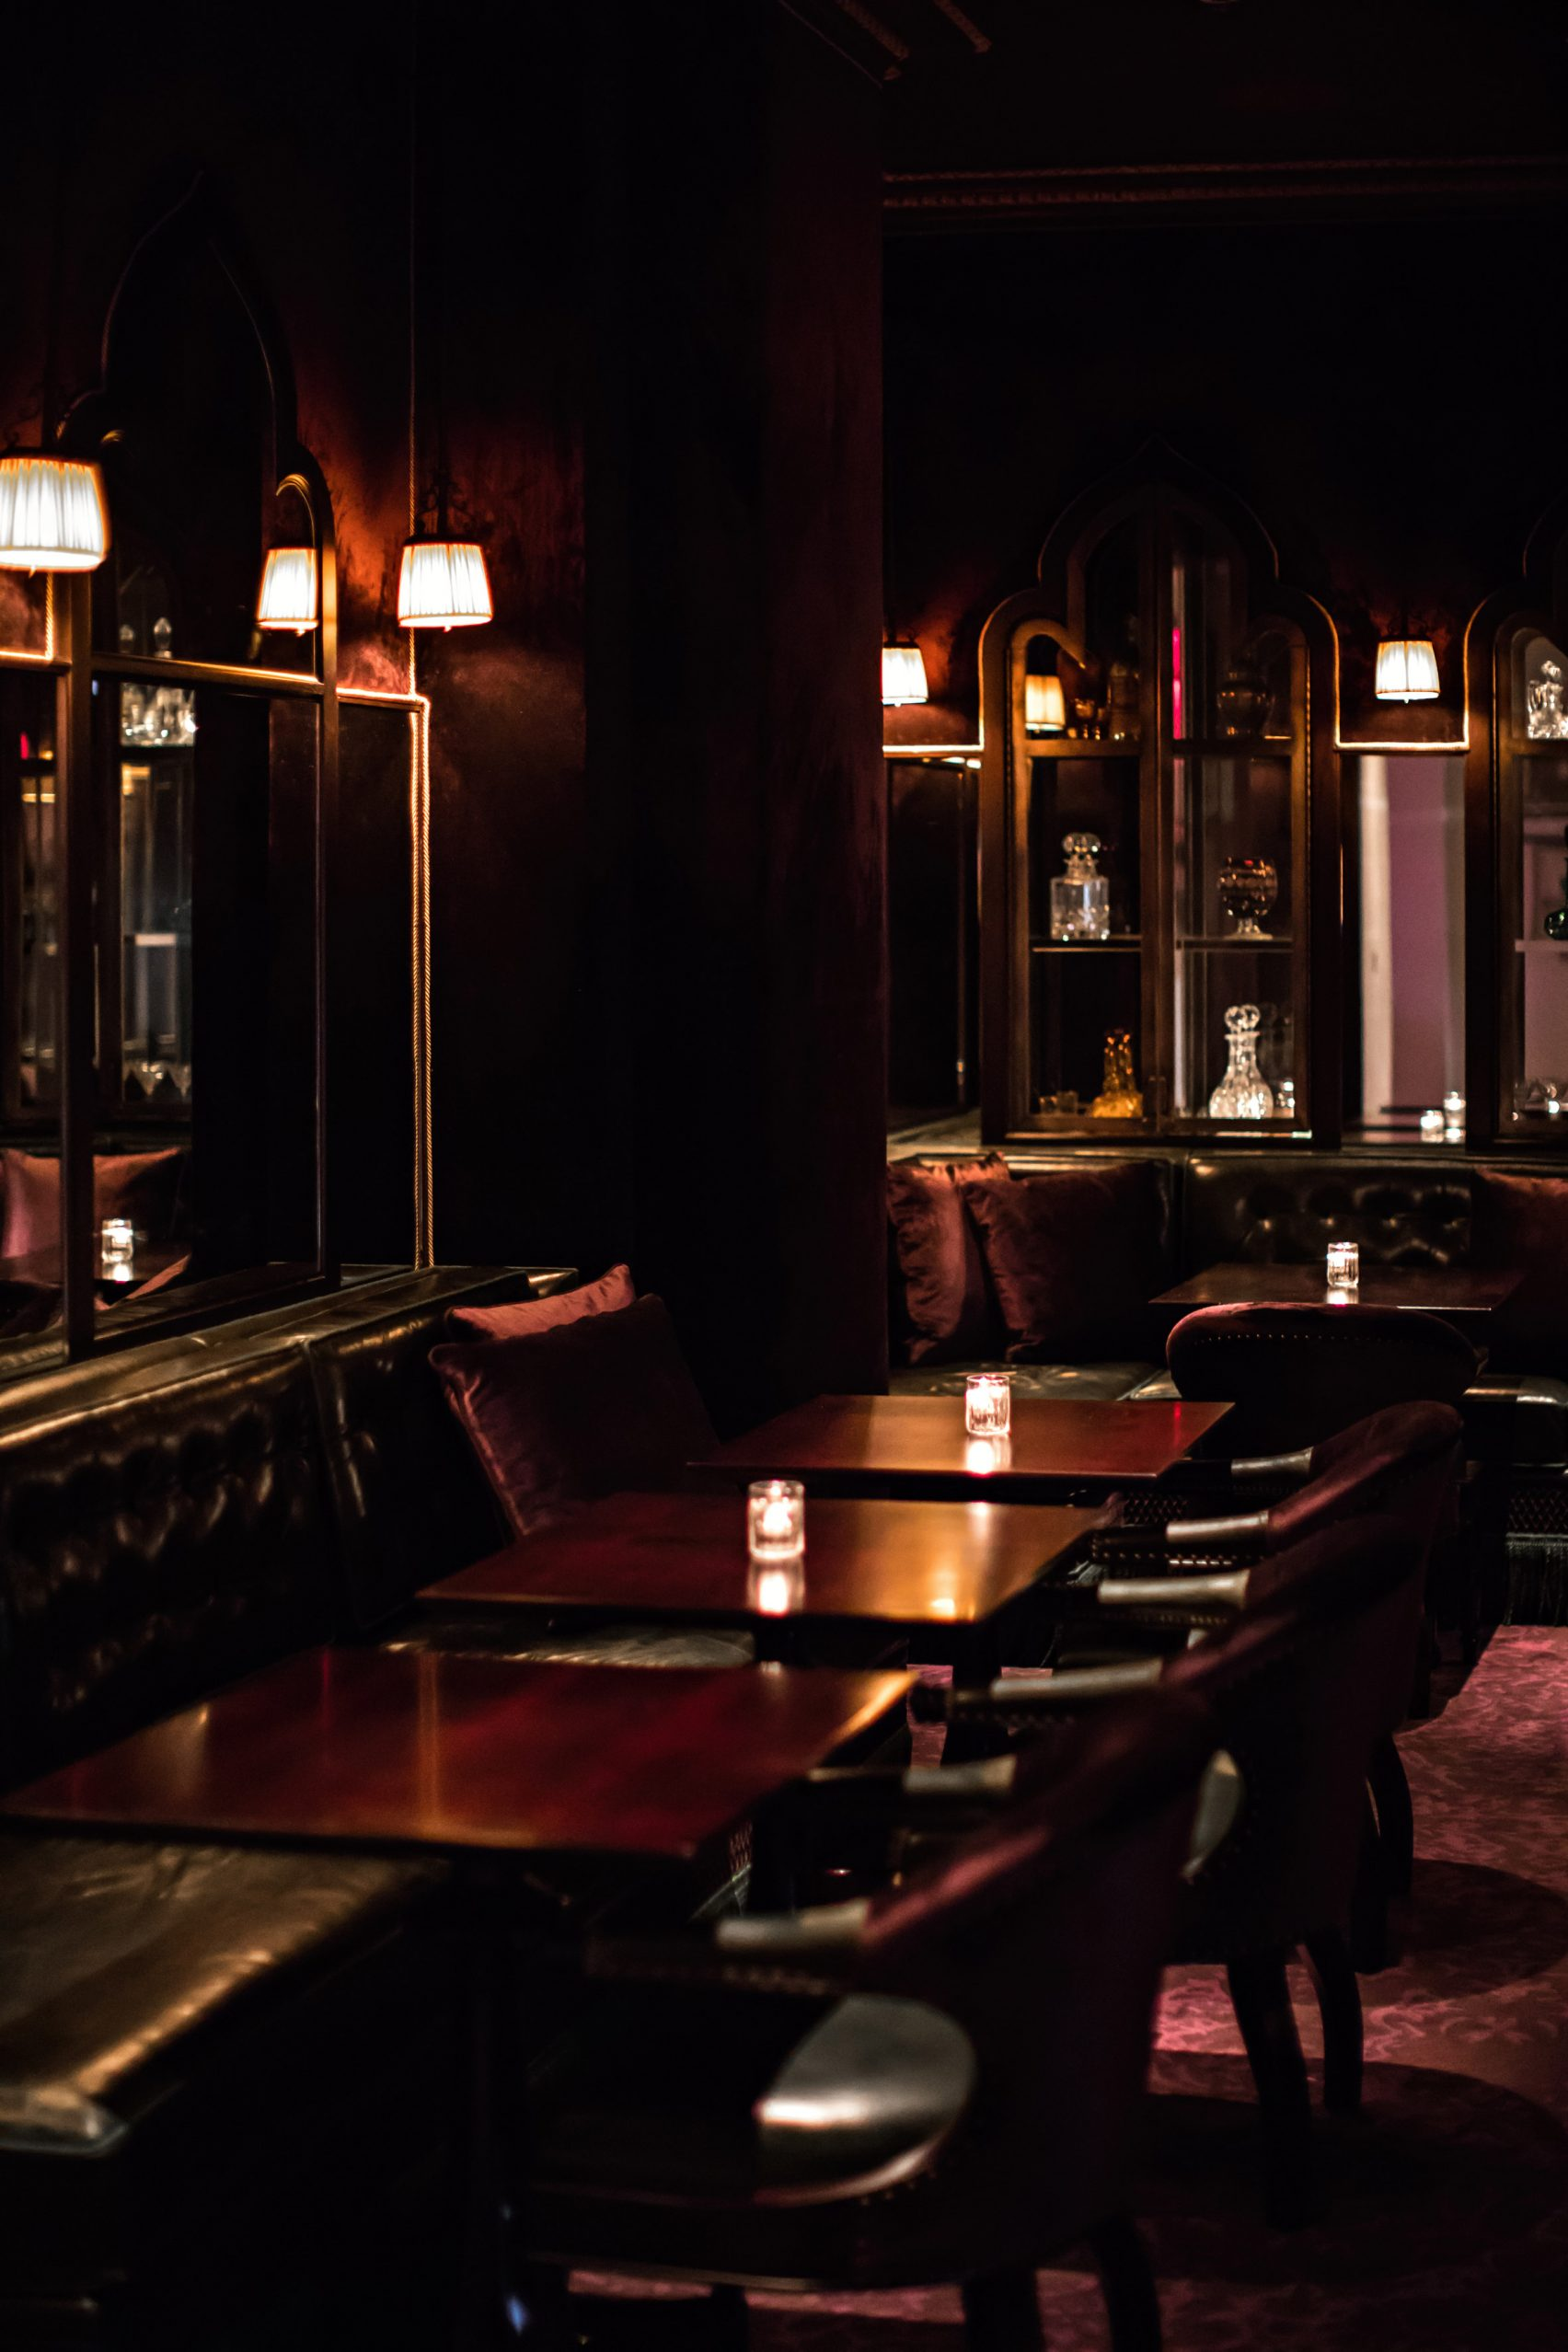 nomad-hotel-los-angeles-jacques-garcia-usa-interiors_dezeen_2364_col_14-1704x2556